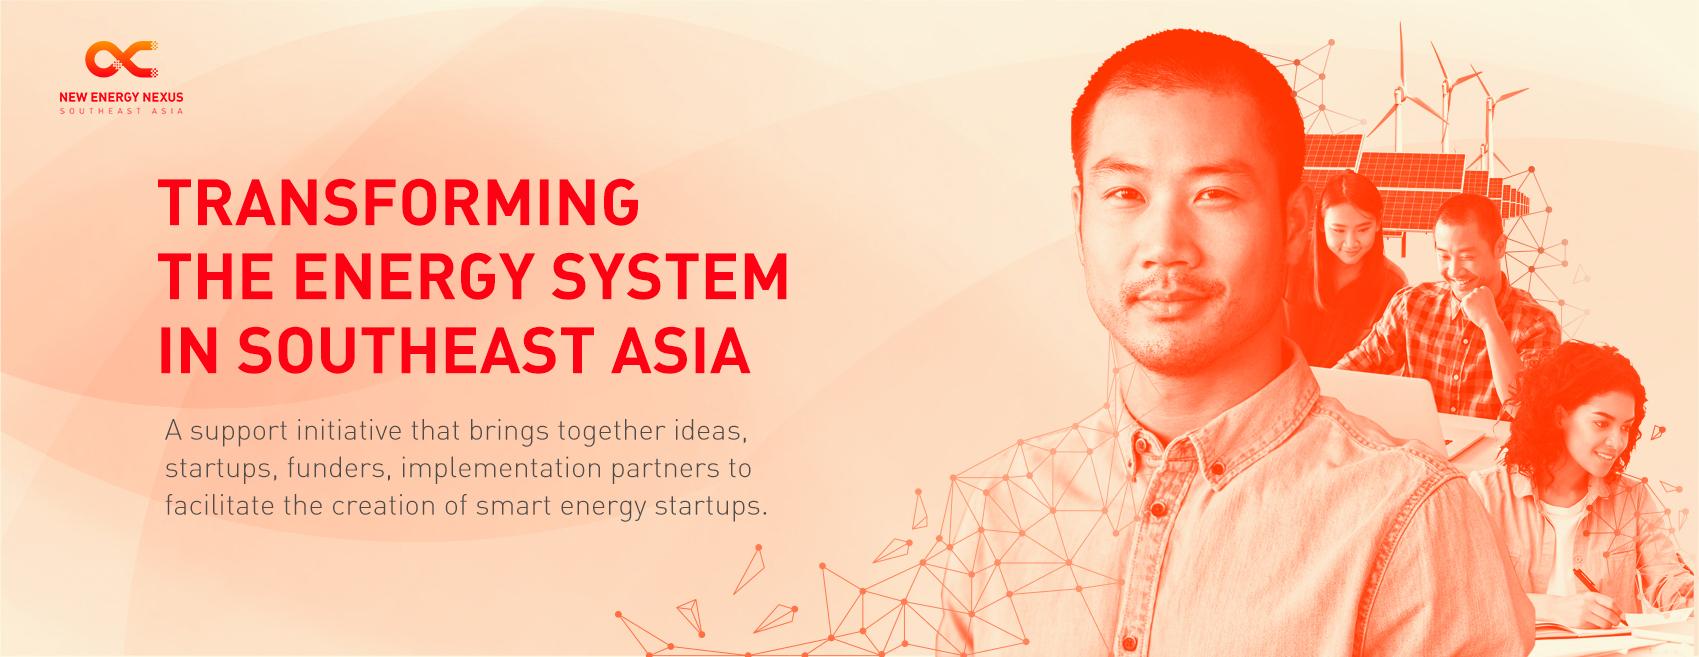 New Energy Nexus Southeast Asia (Nexus SEA)